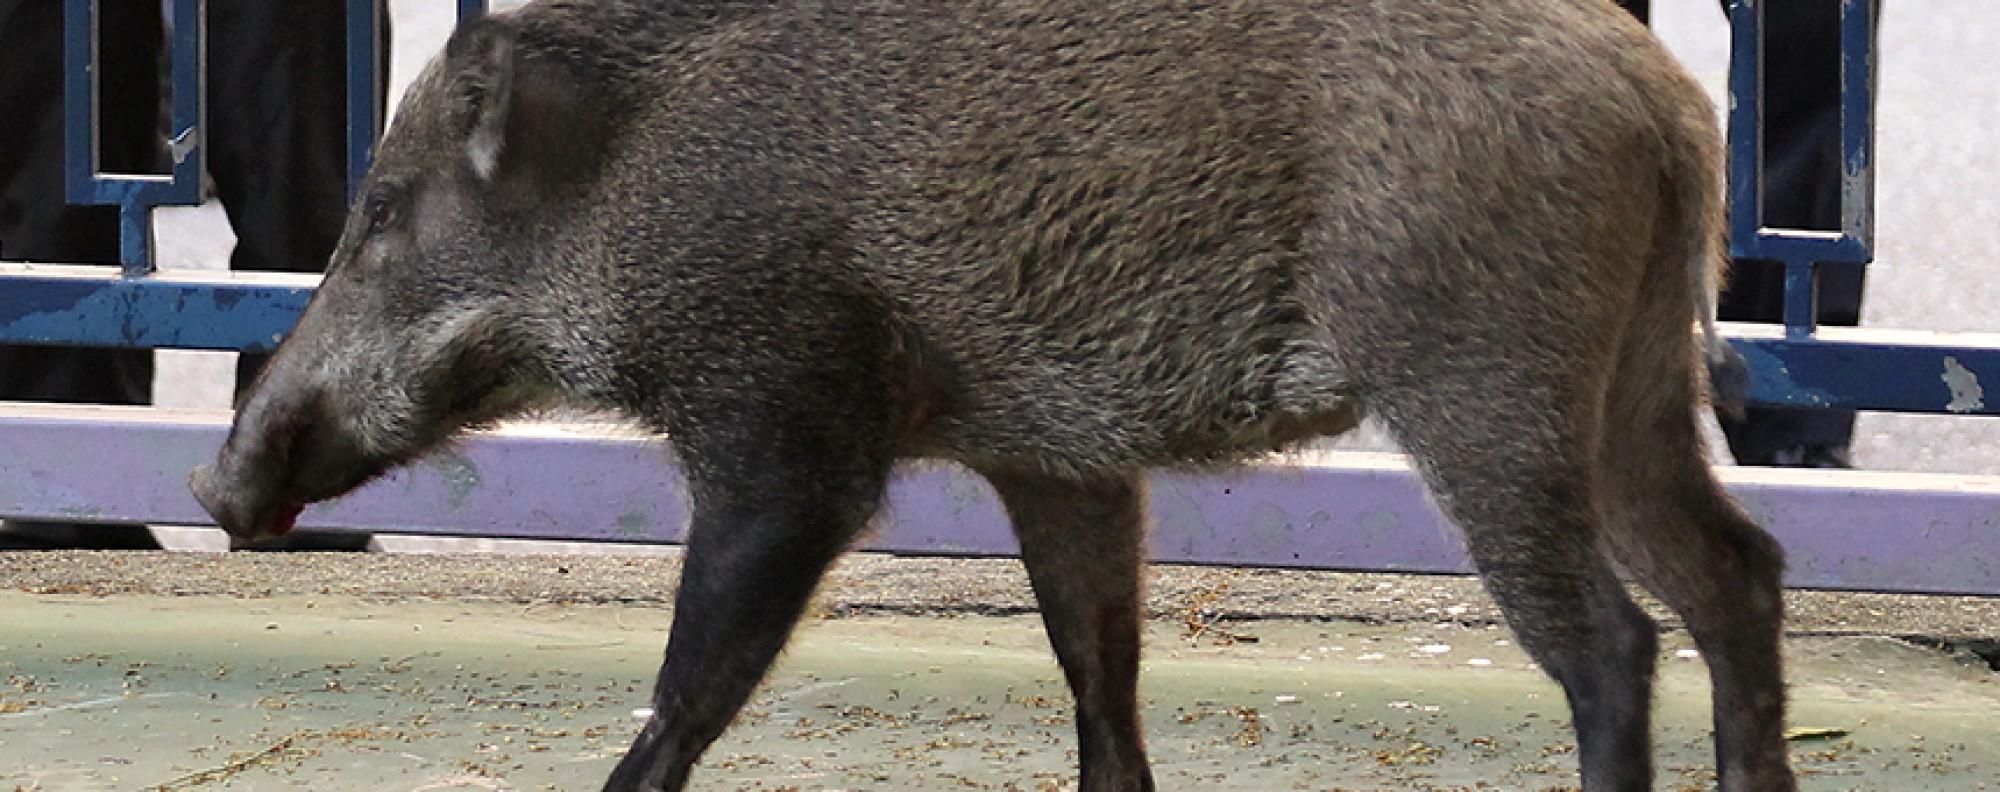 Wild boar | South China Morning Post